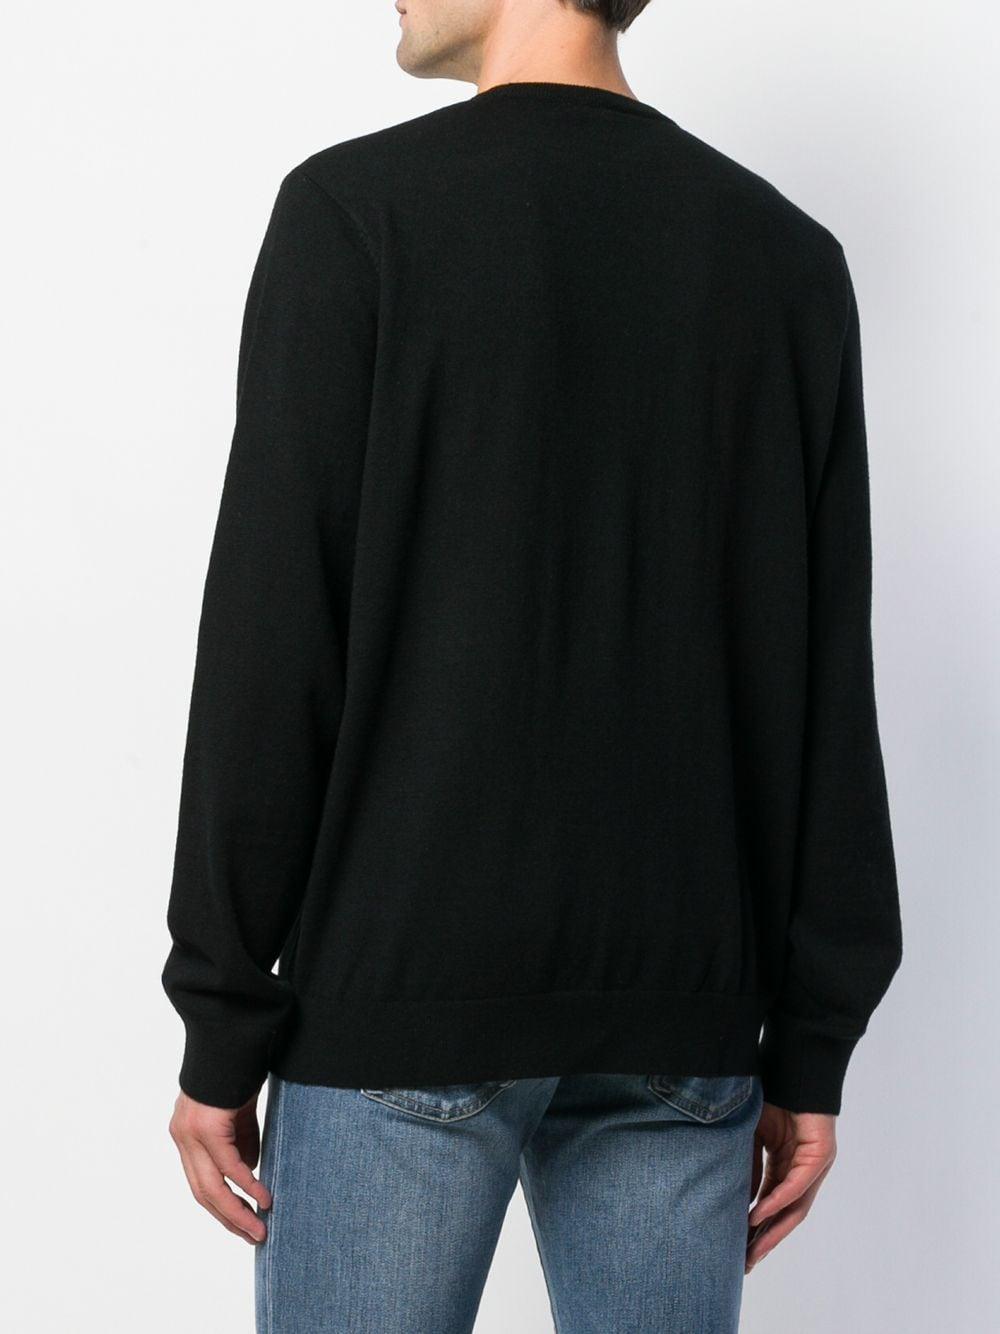 crewneck sweater man black CARHARTT WIP | Sweaters | I02377689.00